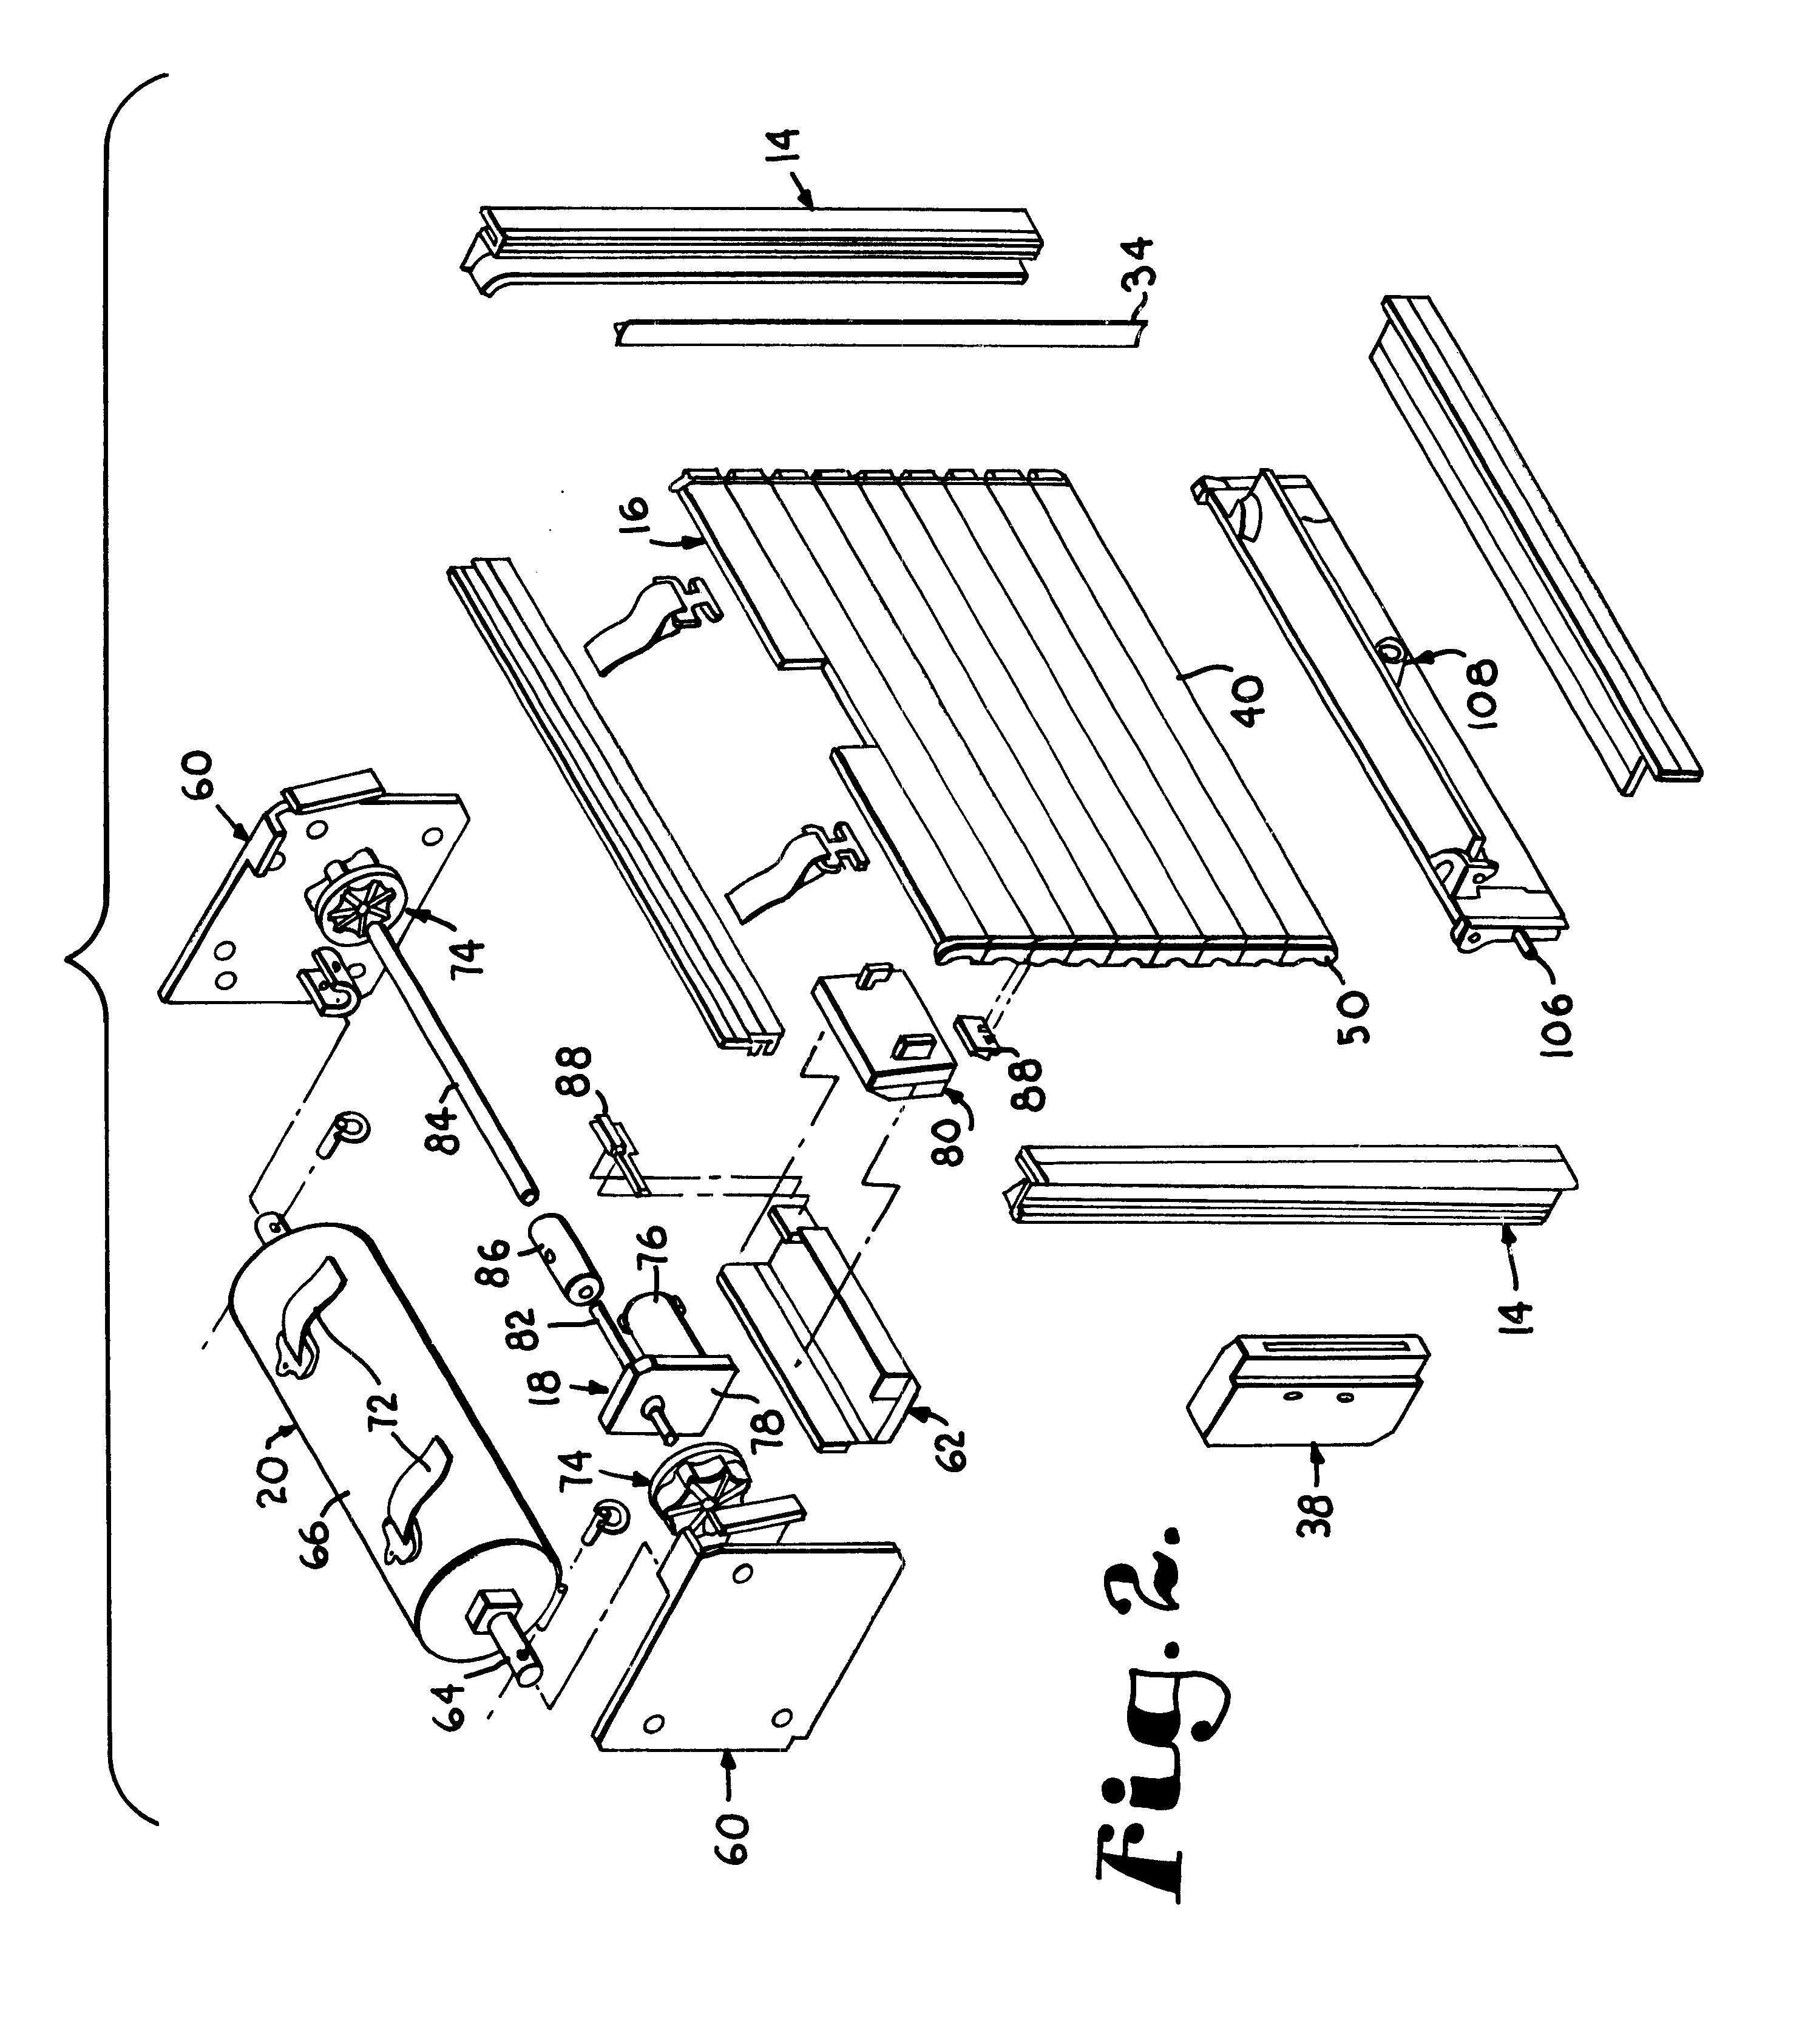 patente us6427749